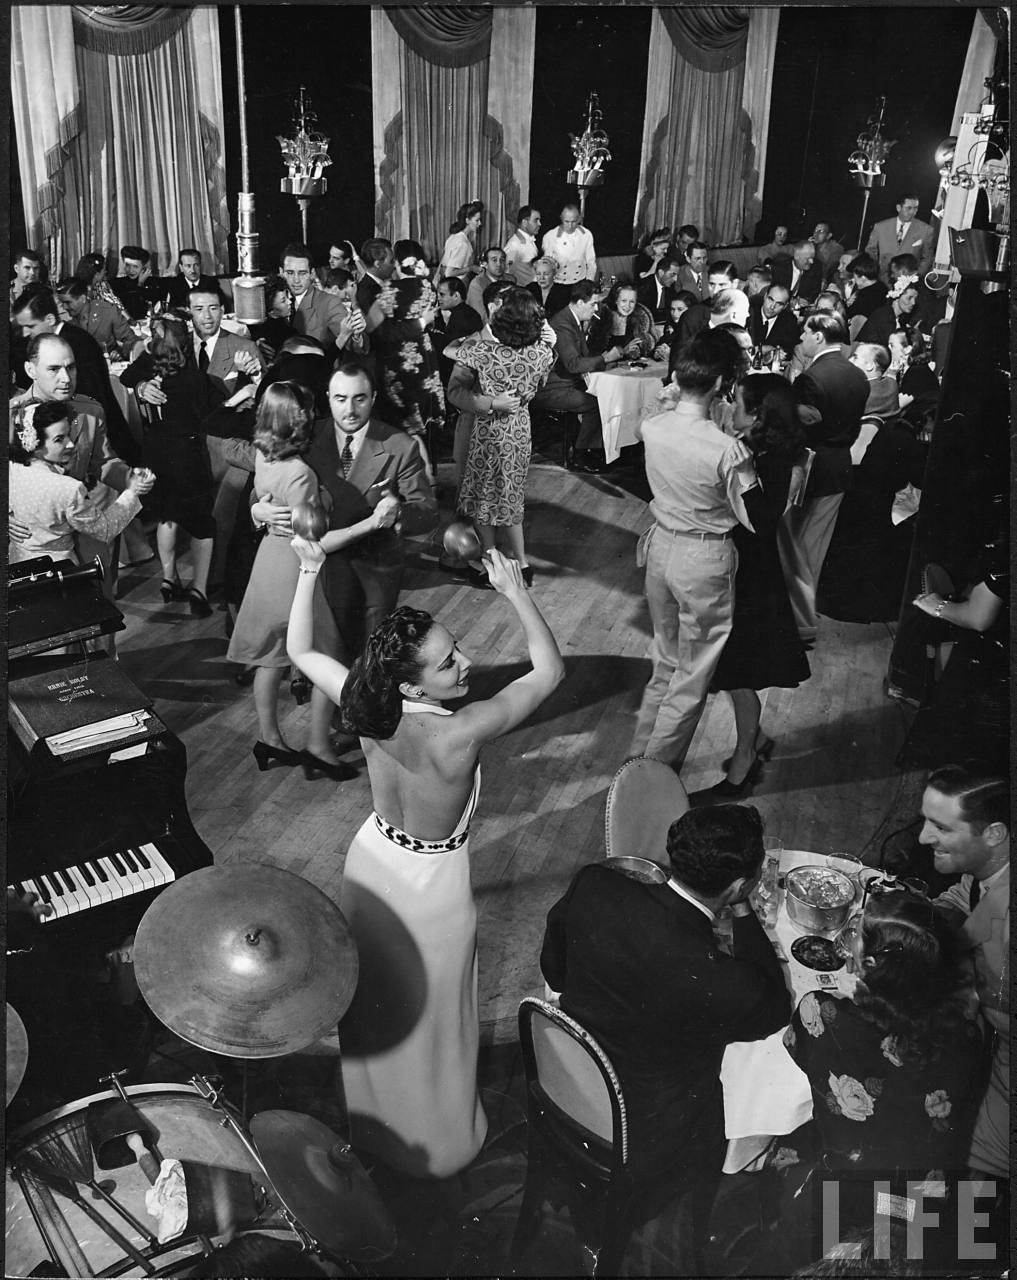 Stork Club dance floor